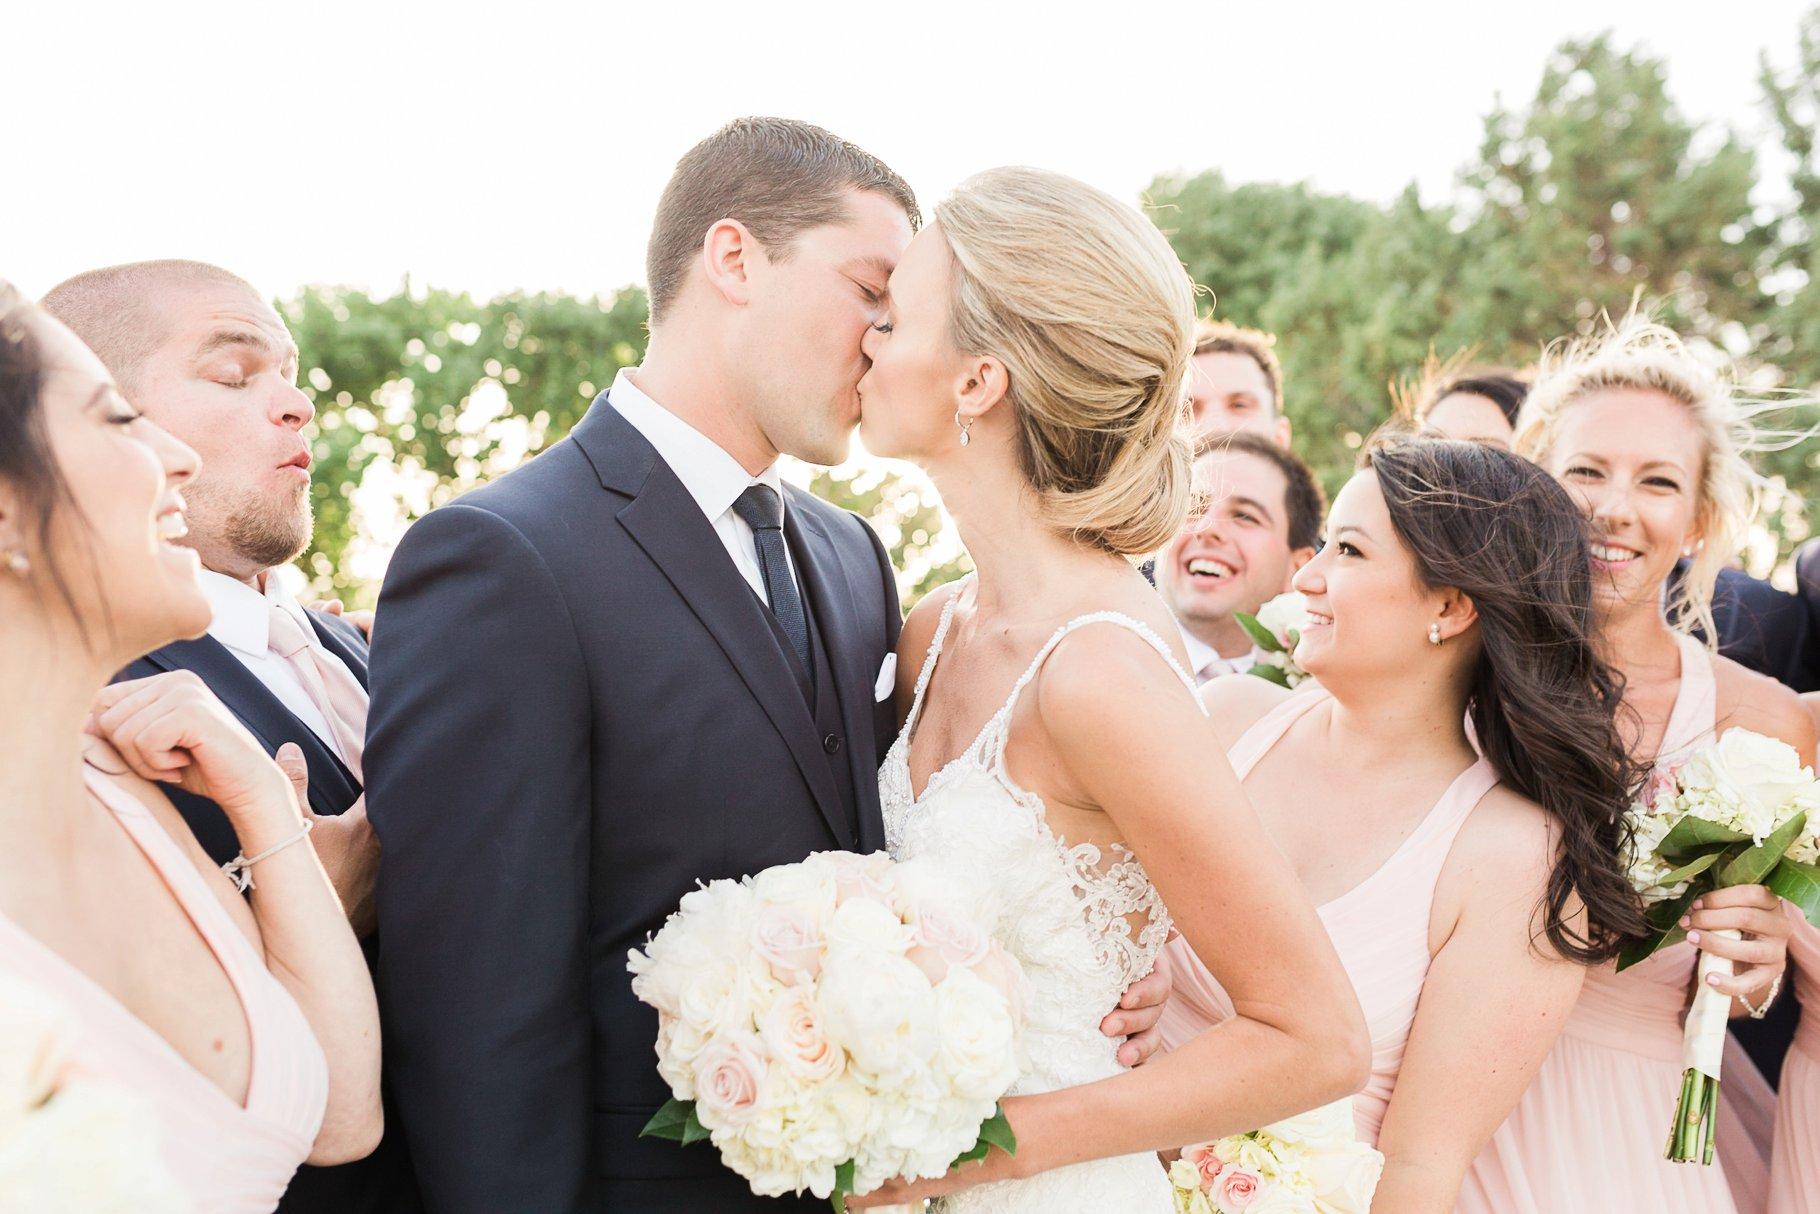 sedona wedding-104_GRETCHEN WAKEMAN PHOTOGRAPHY.jpg